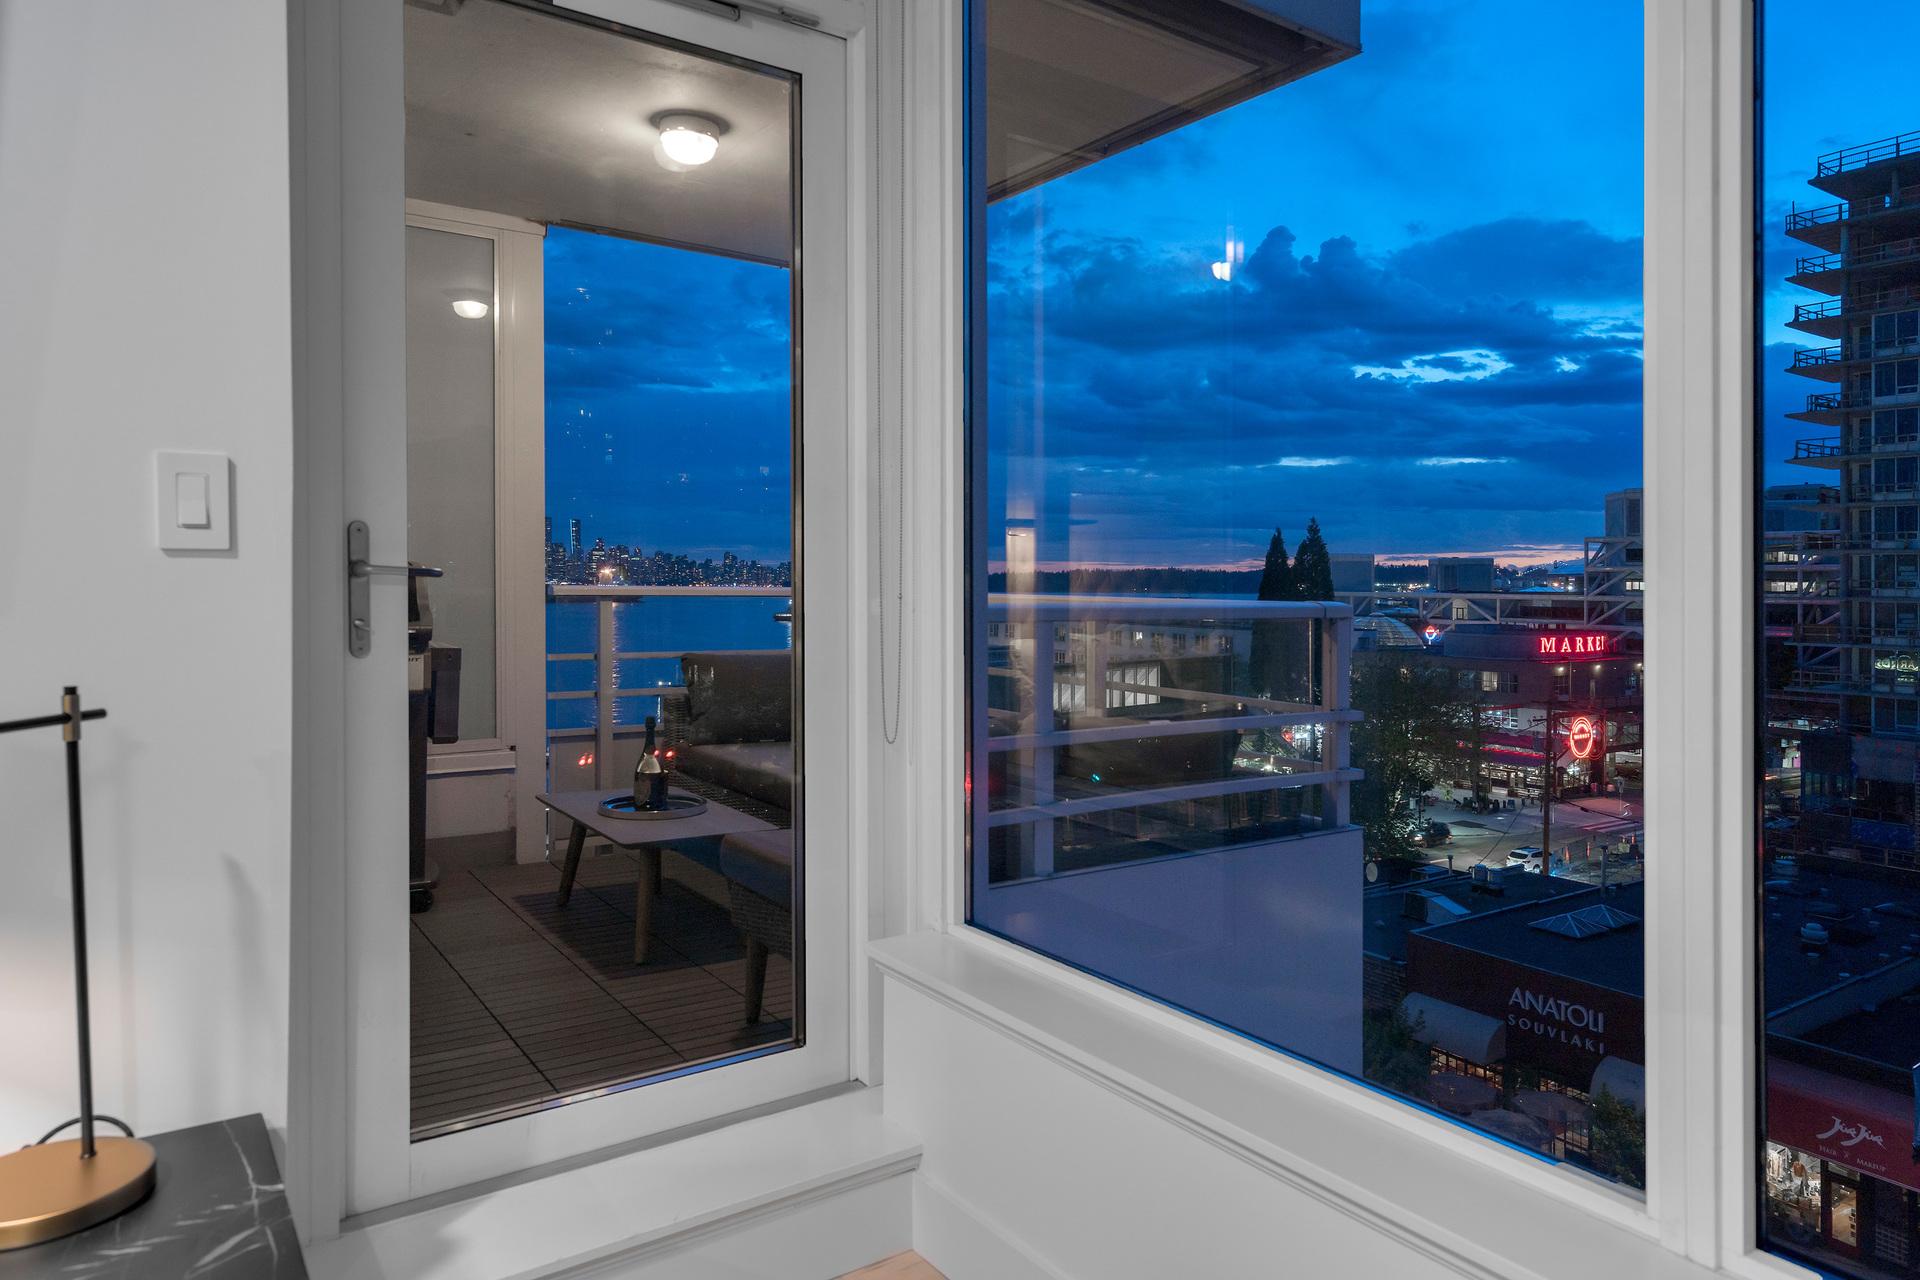 503-133-e-esplanade-ave-360hometours-06 at 503 - 133 E Esplanade, Lower Lonsdale, North Vancouver